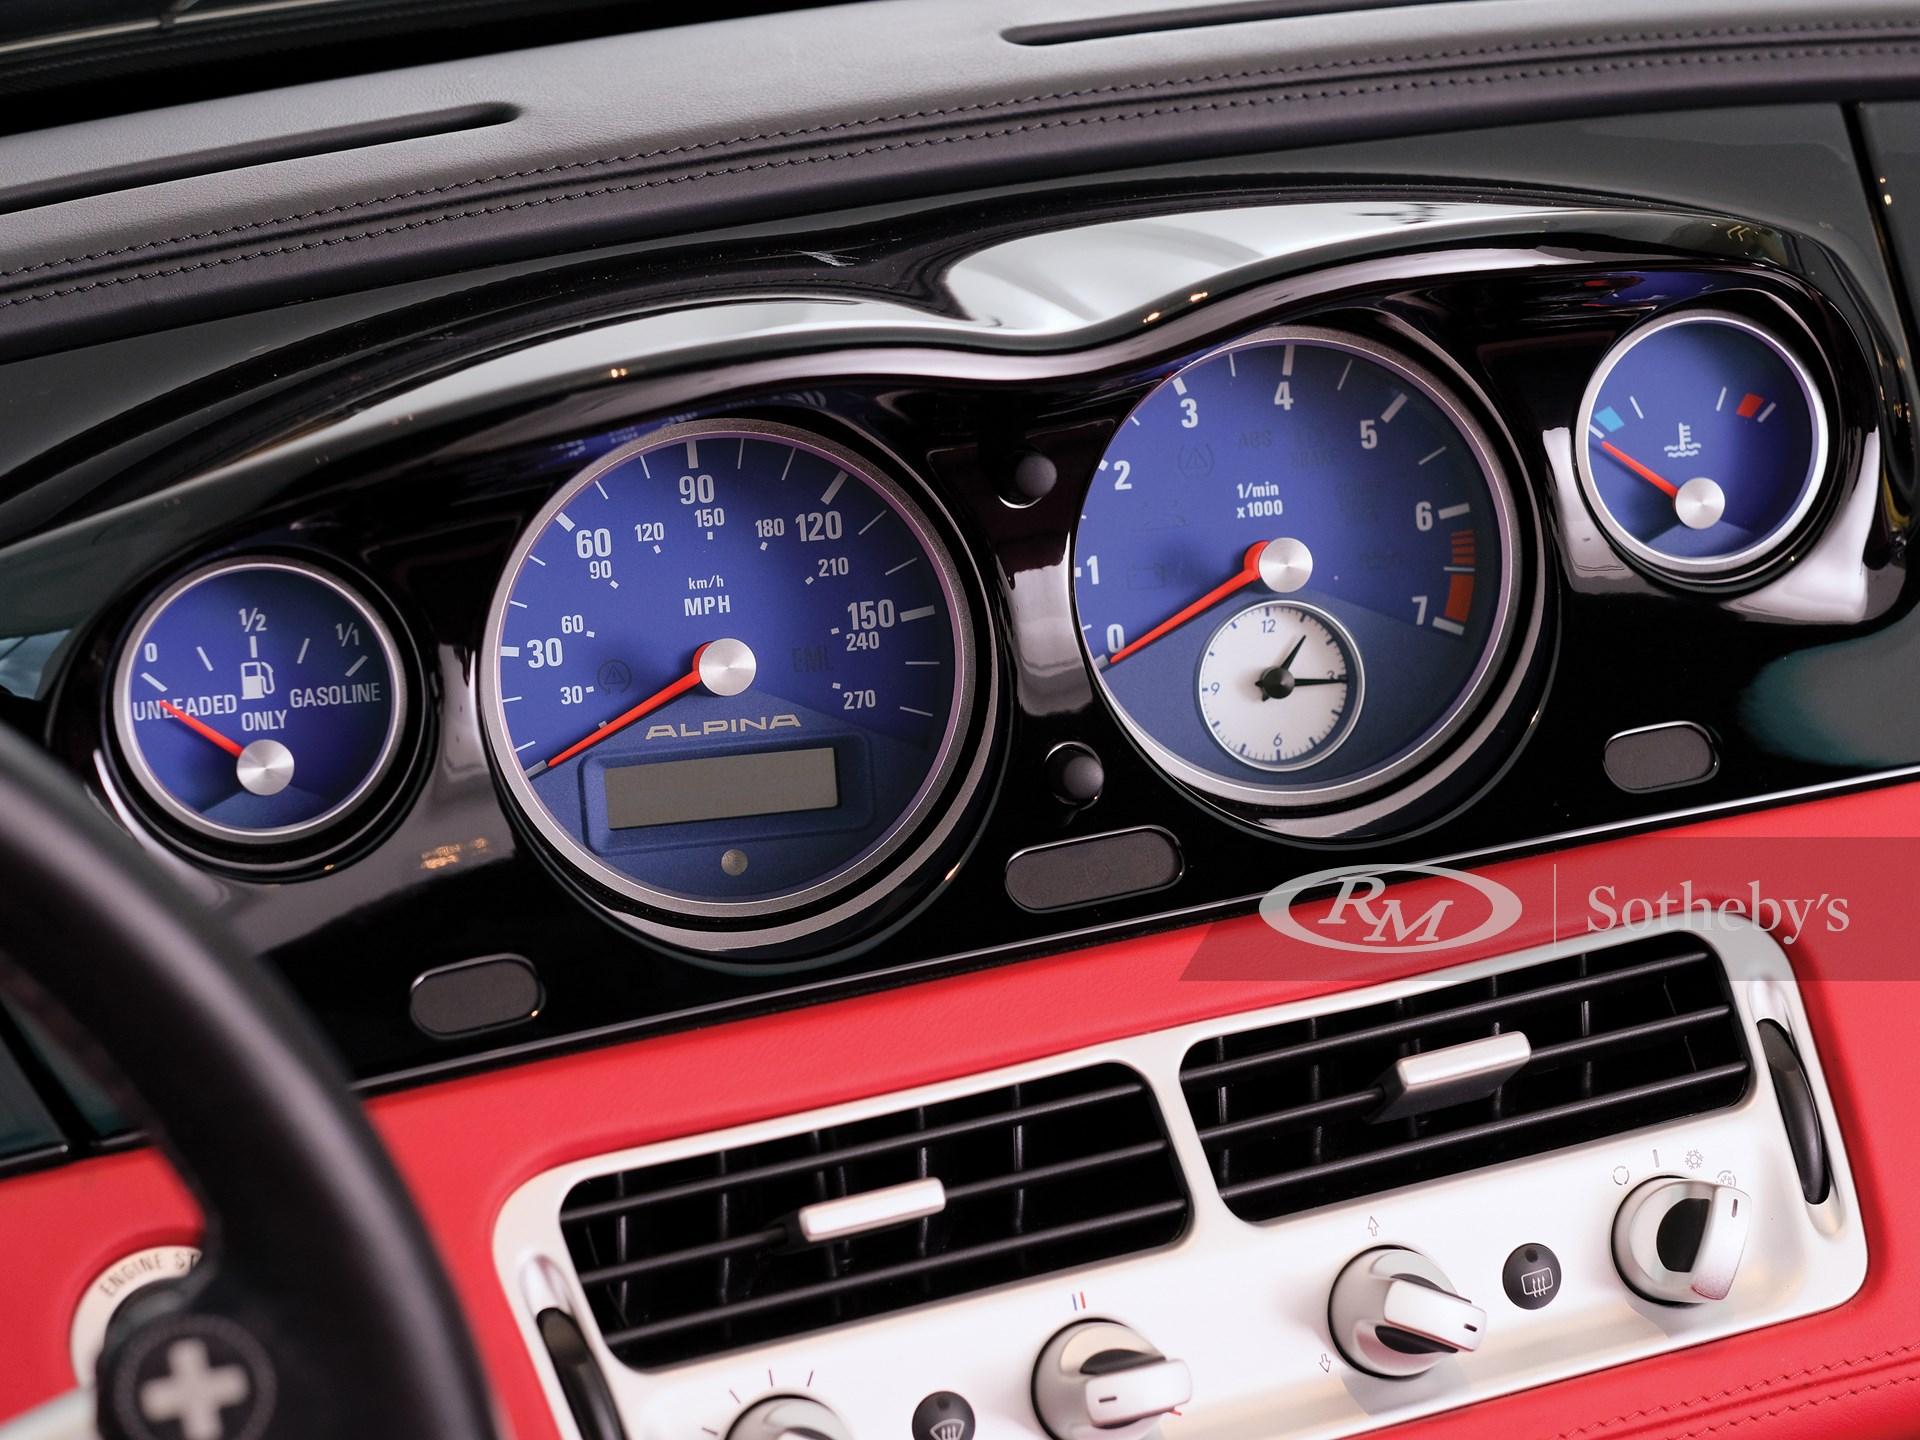 2003 BMW Alpina V8 Roadster  -